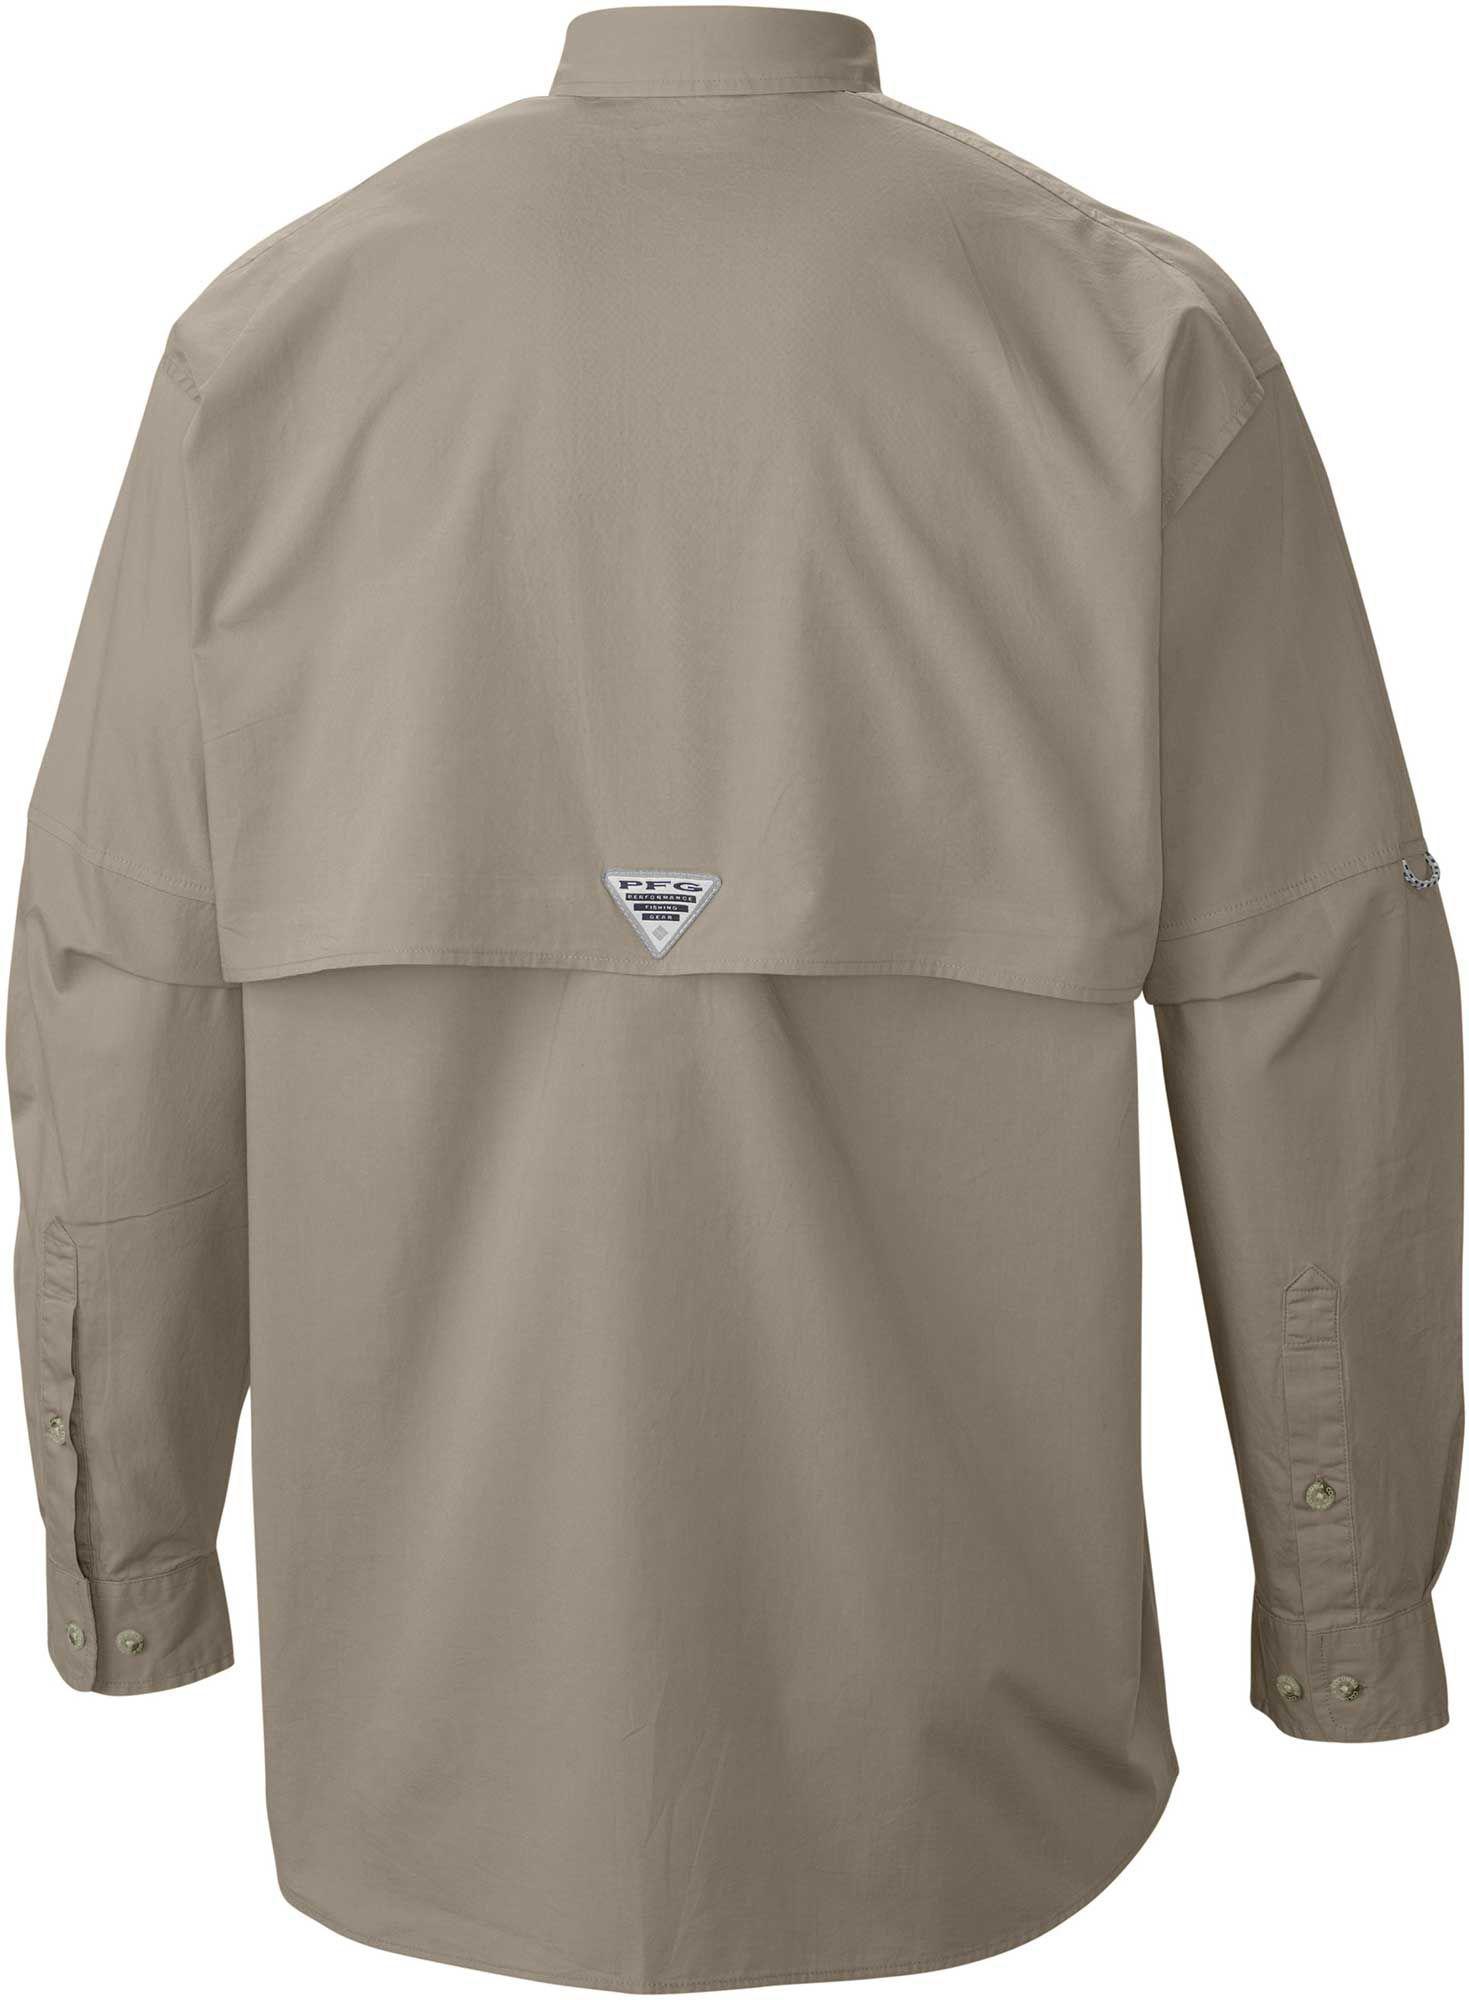 magellan angler fit fishing shirt - HD1469×2000